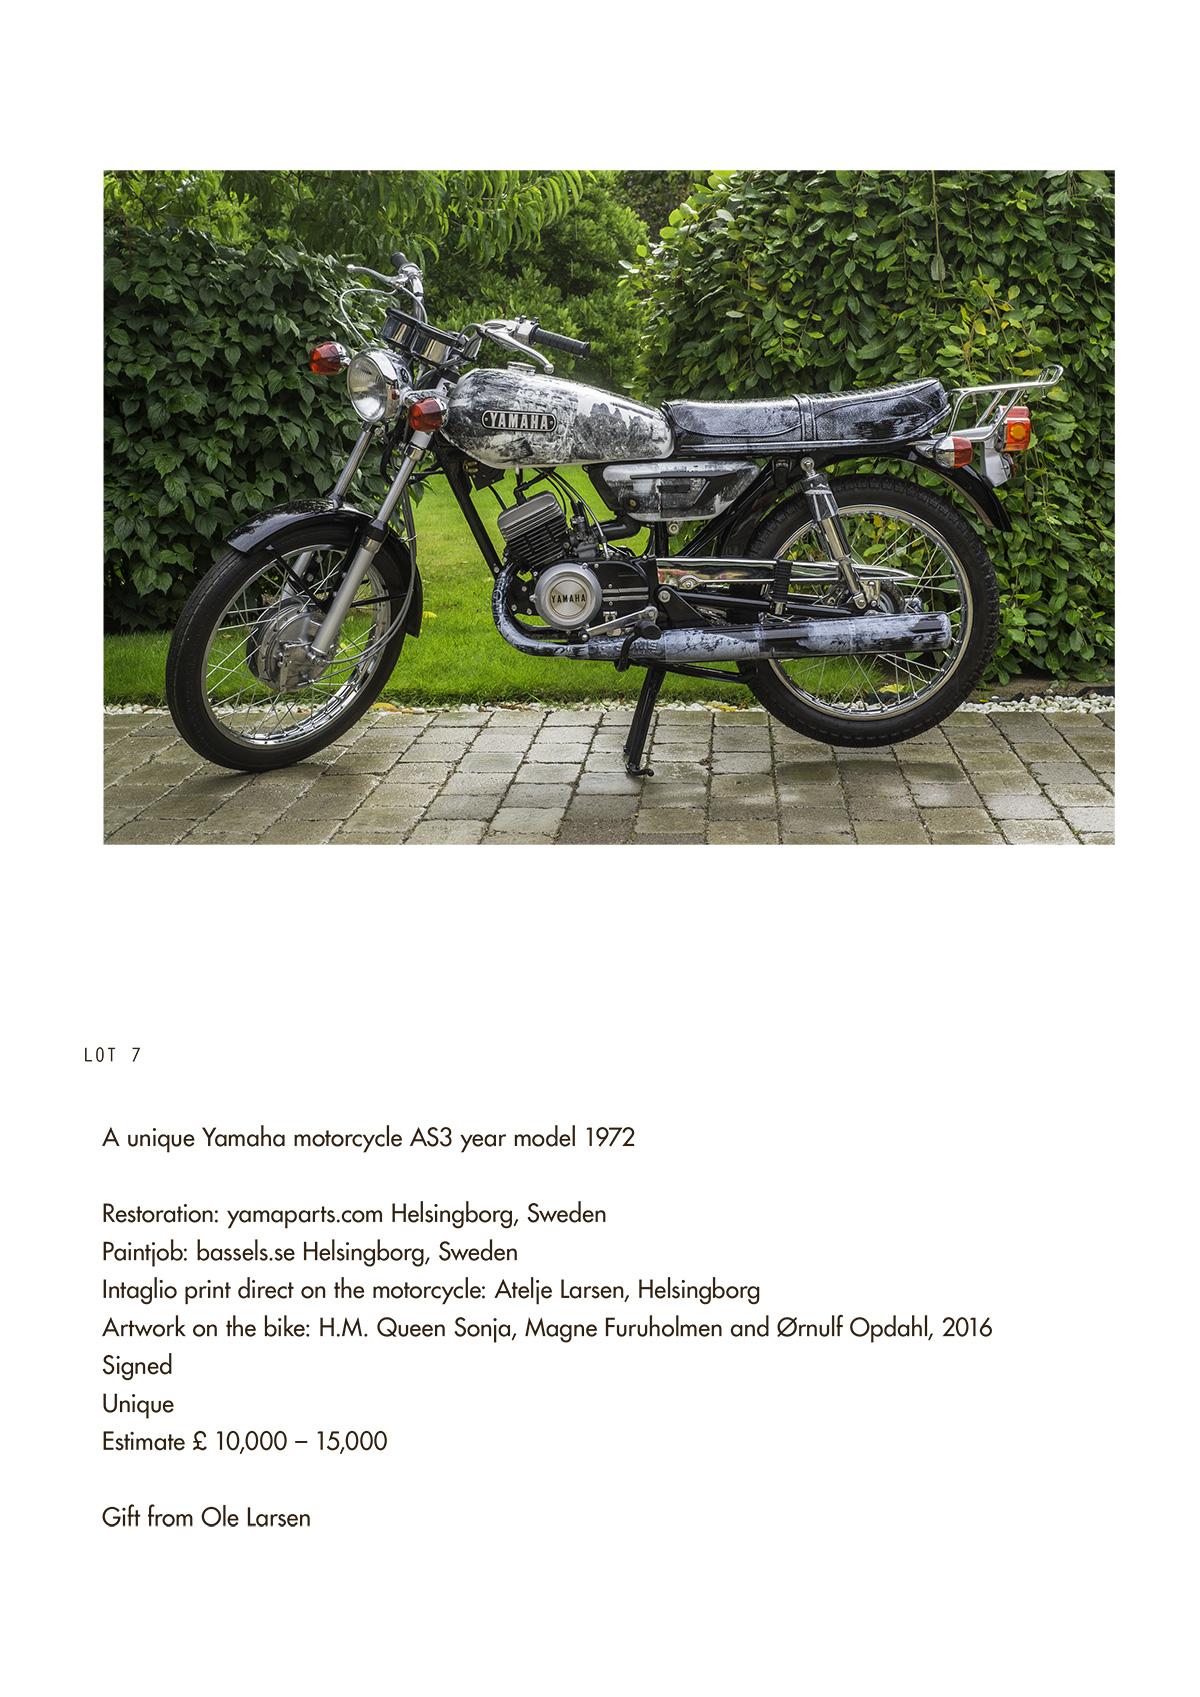 Art-bike